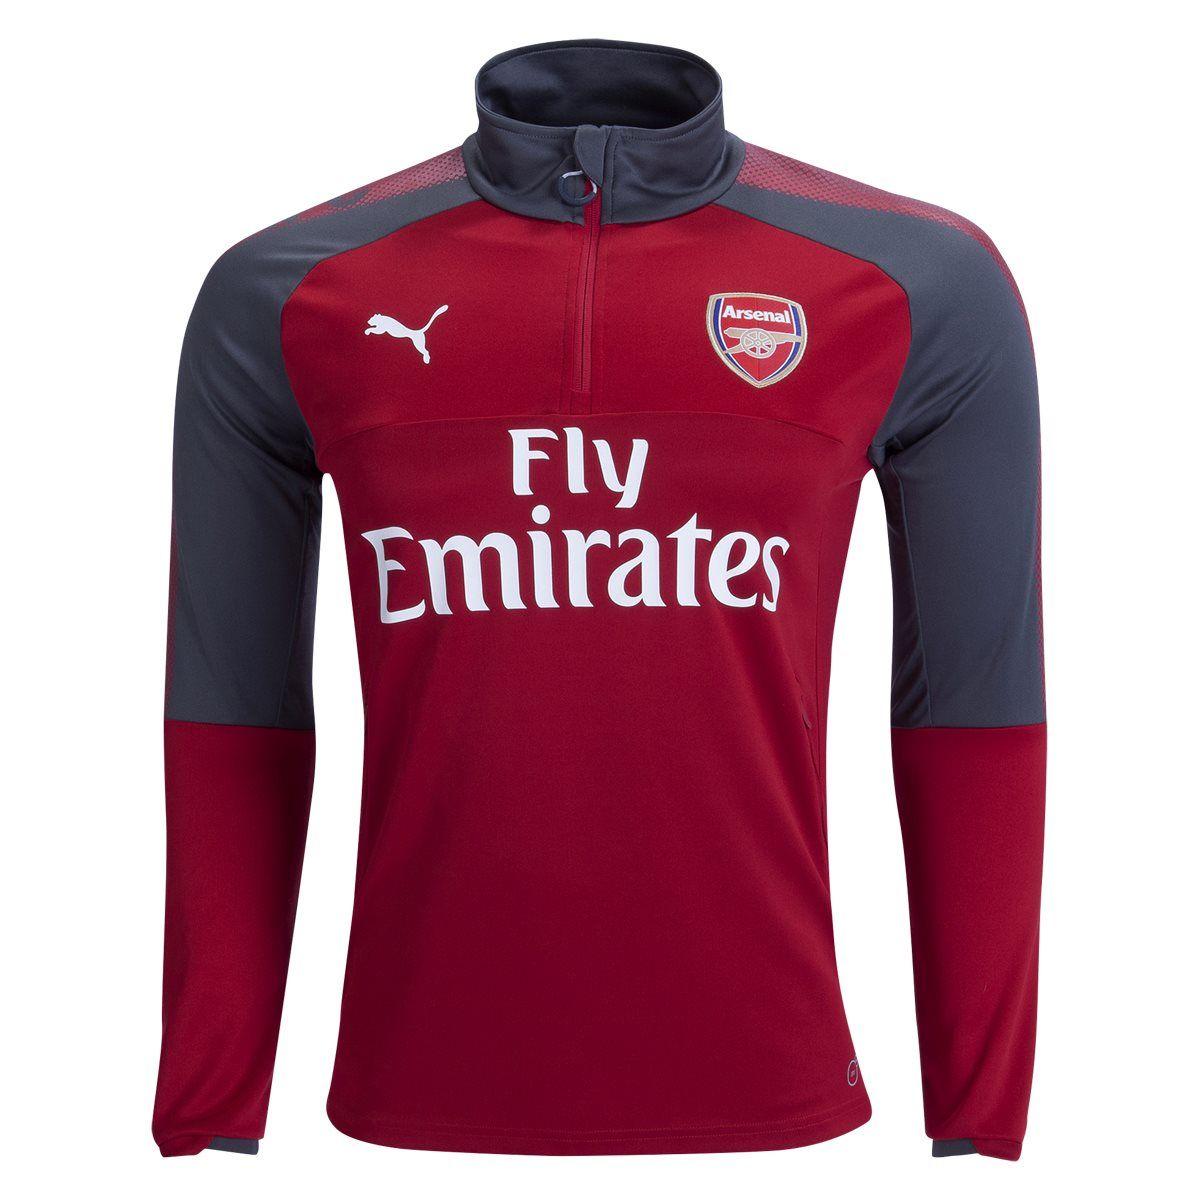 PUMA Arsenal Long Sleeve Home 1 4 Top 17 18  c7766baff